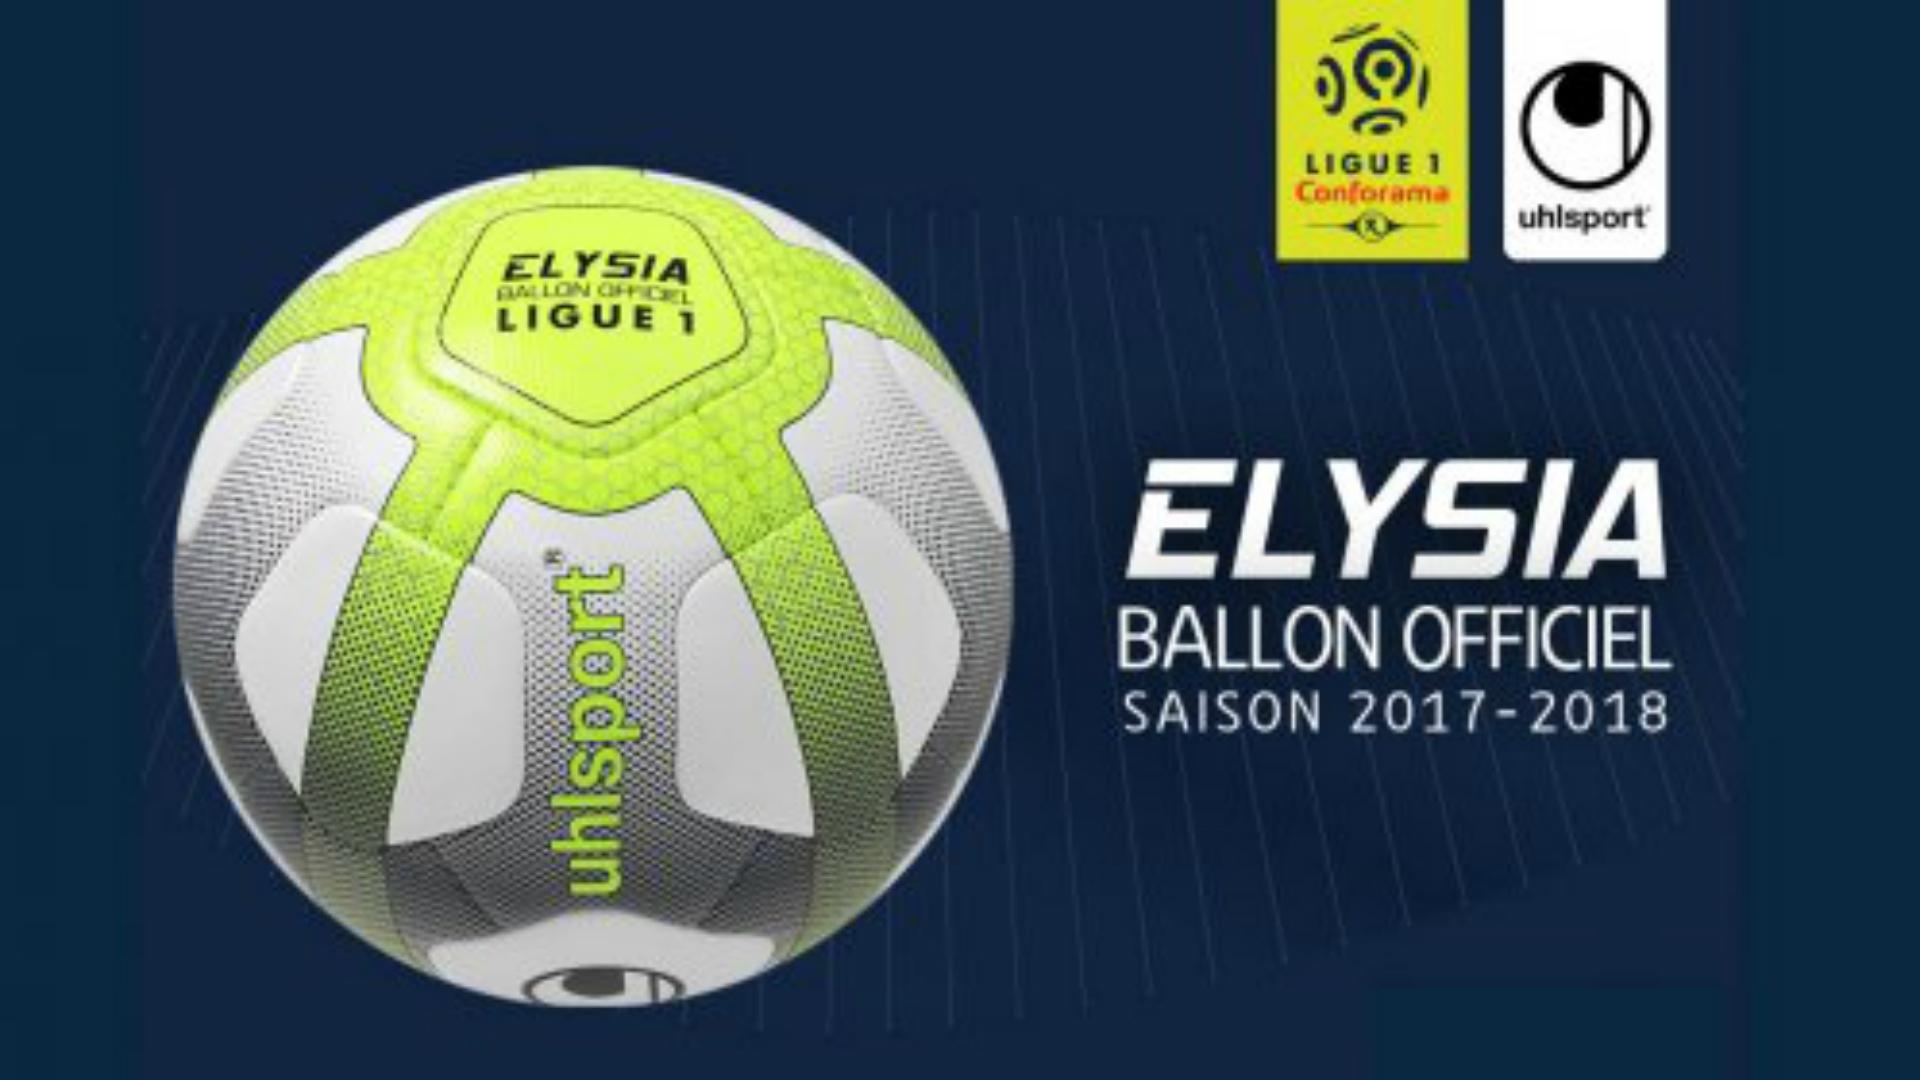 Ligue 1 Elysia matchaball